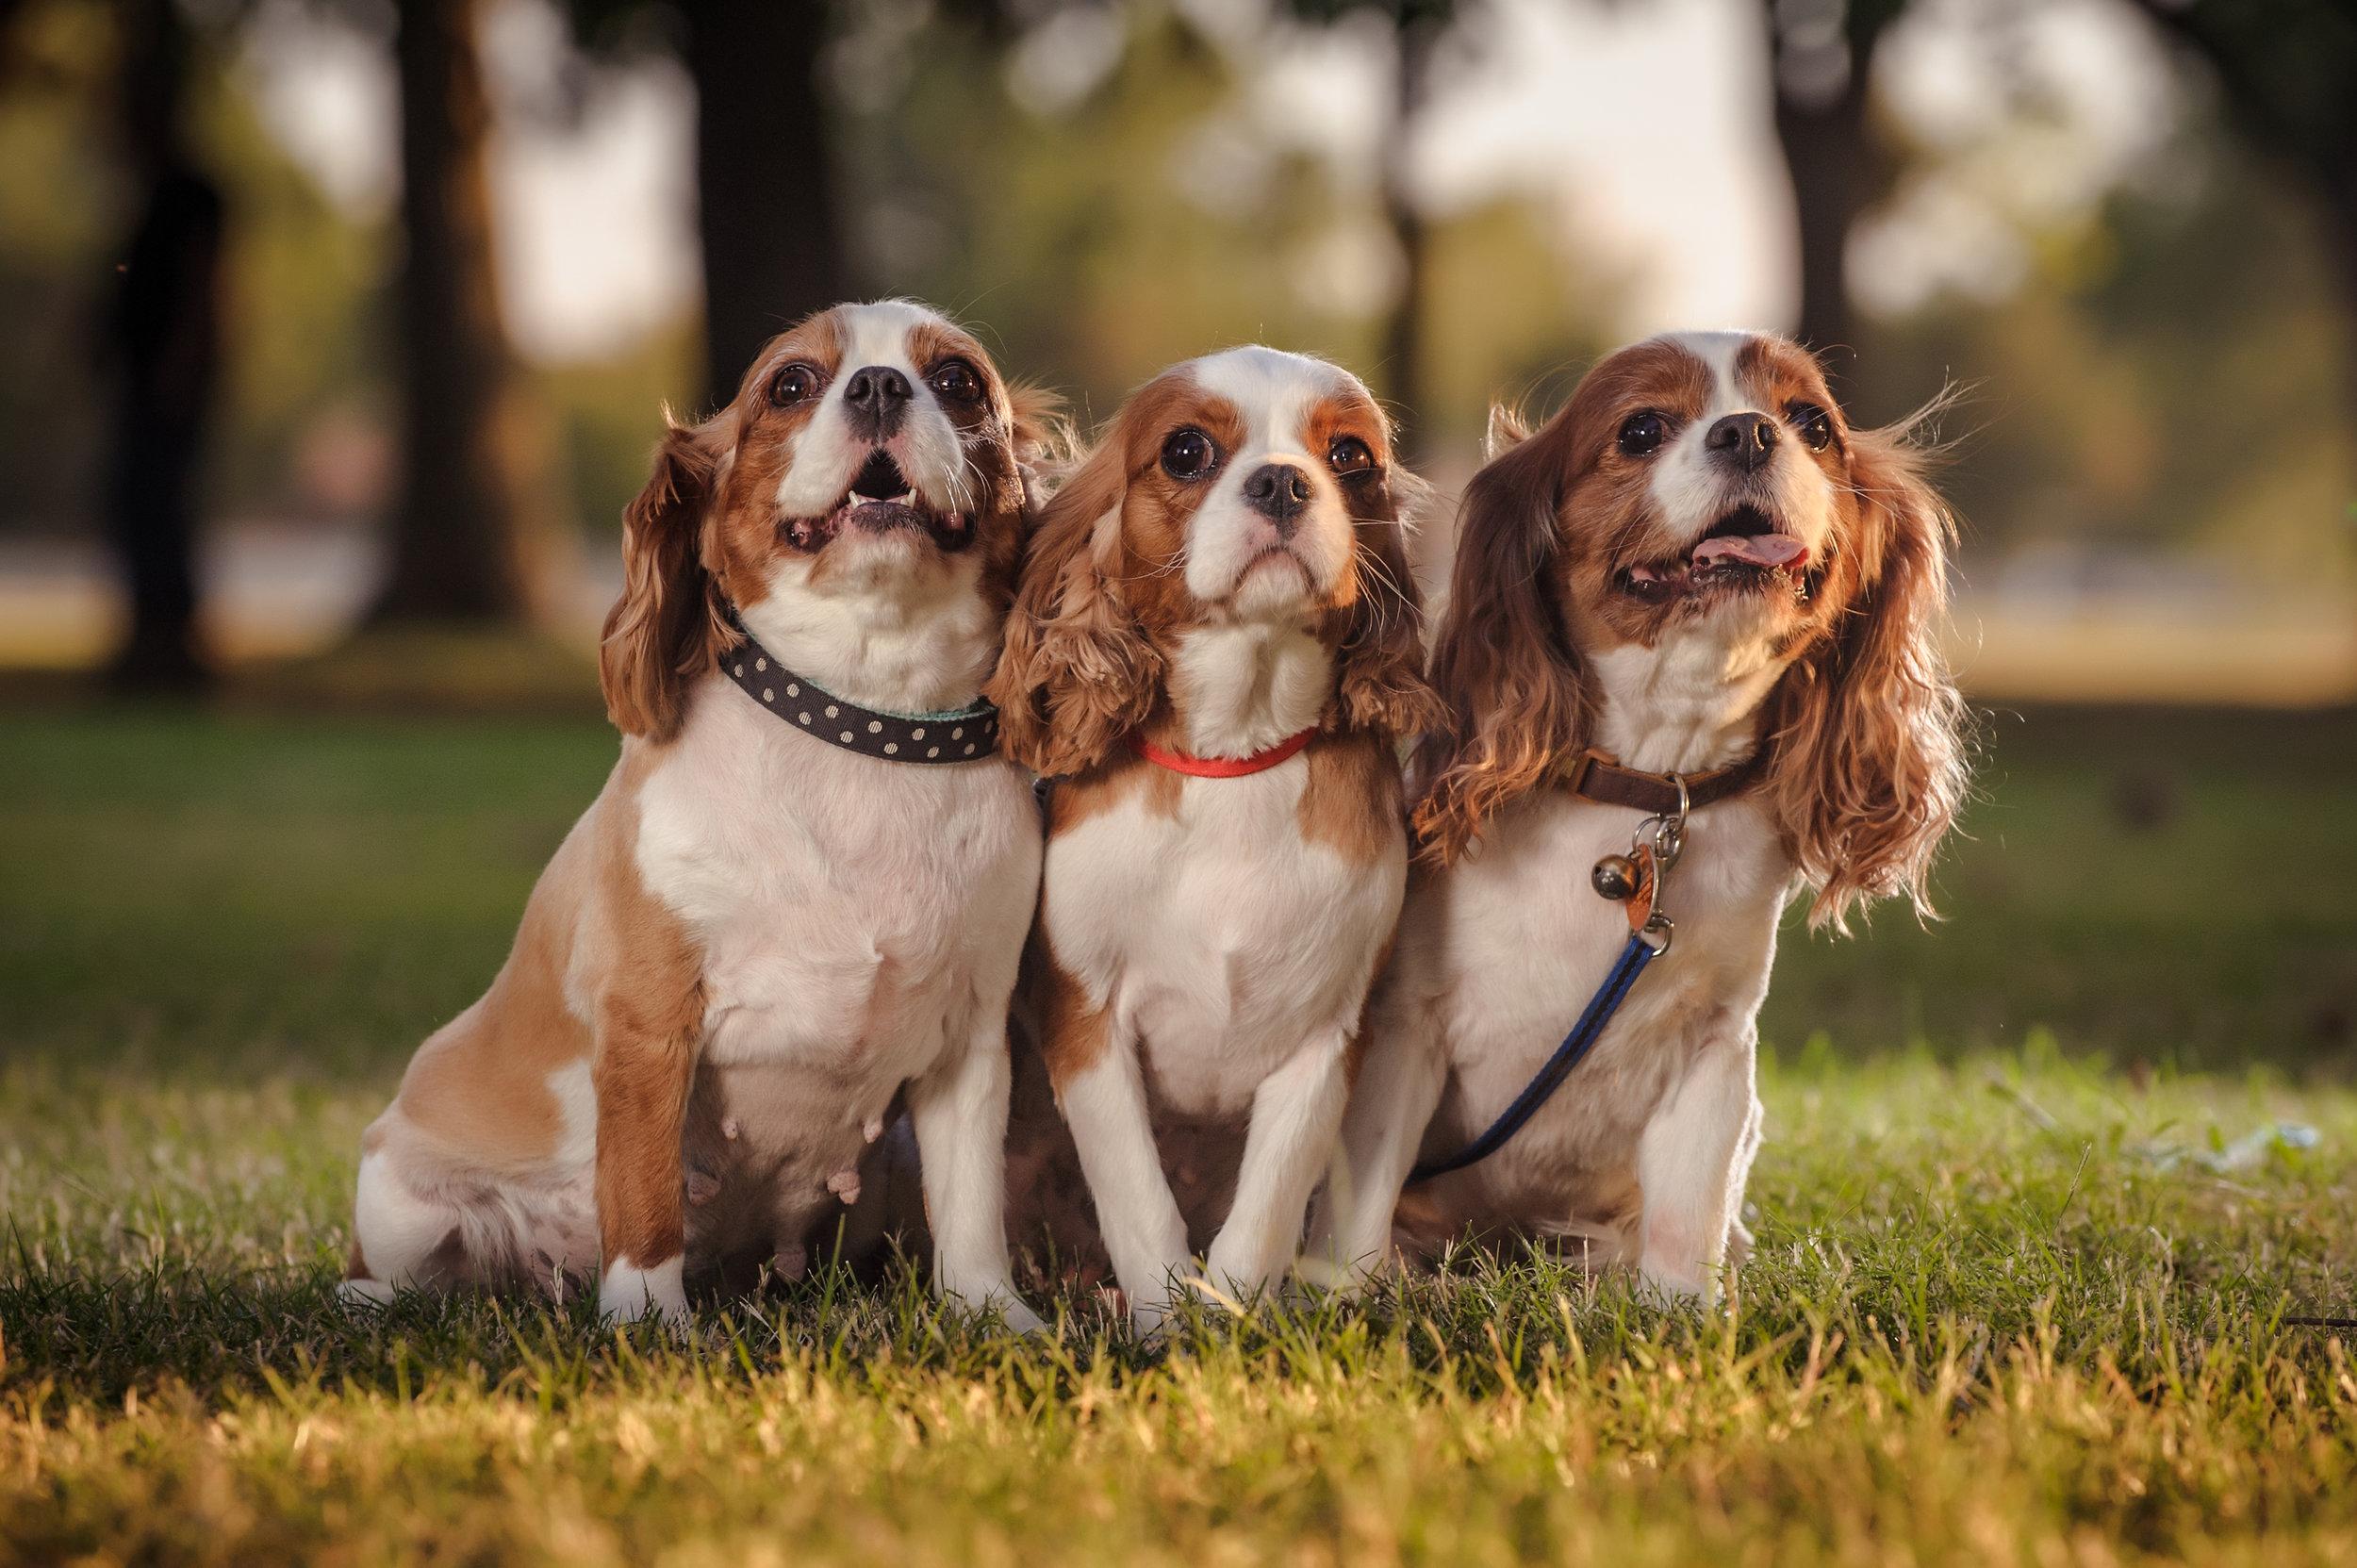 okc-pet-photographer-family-dog-puppies.jpg